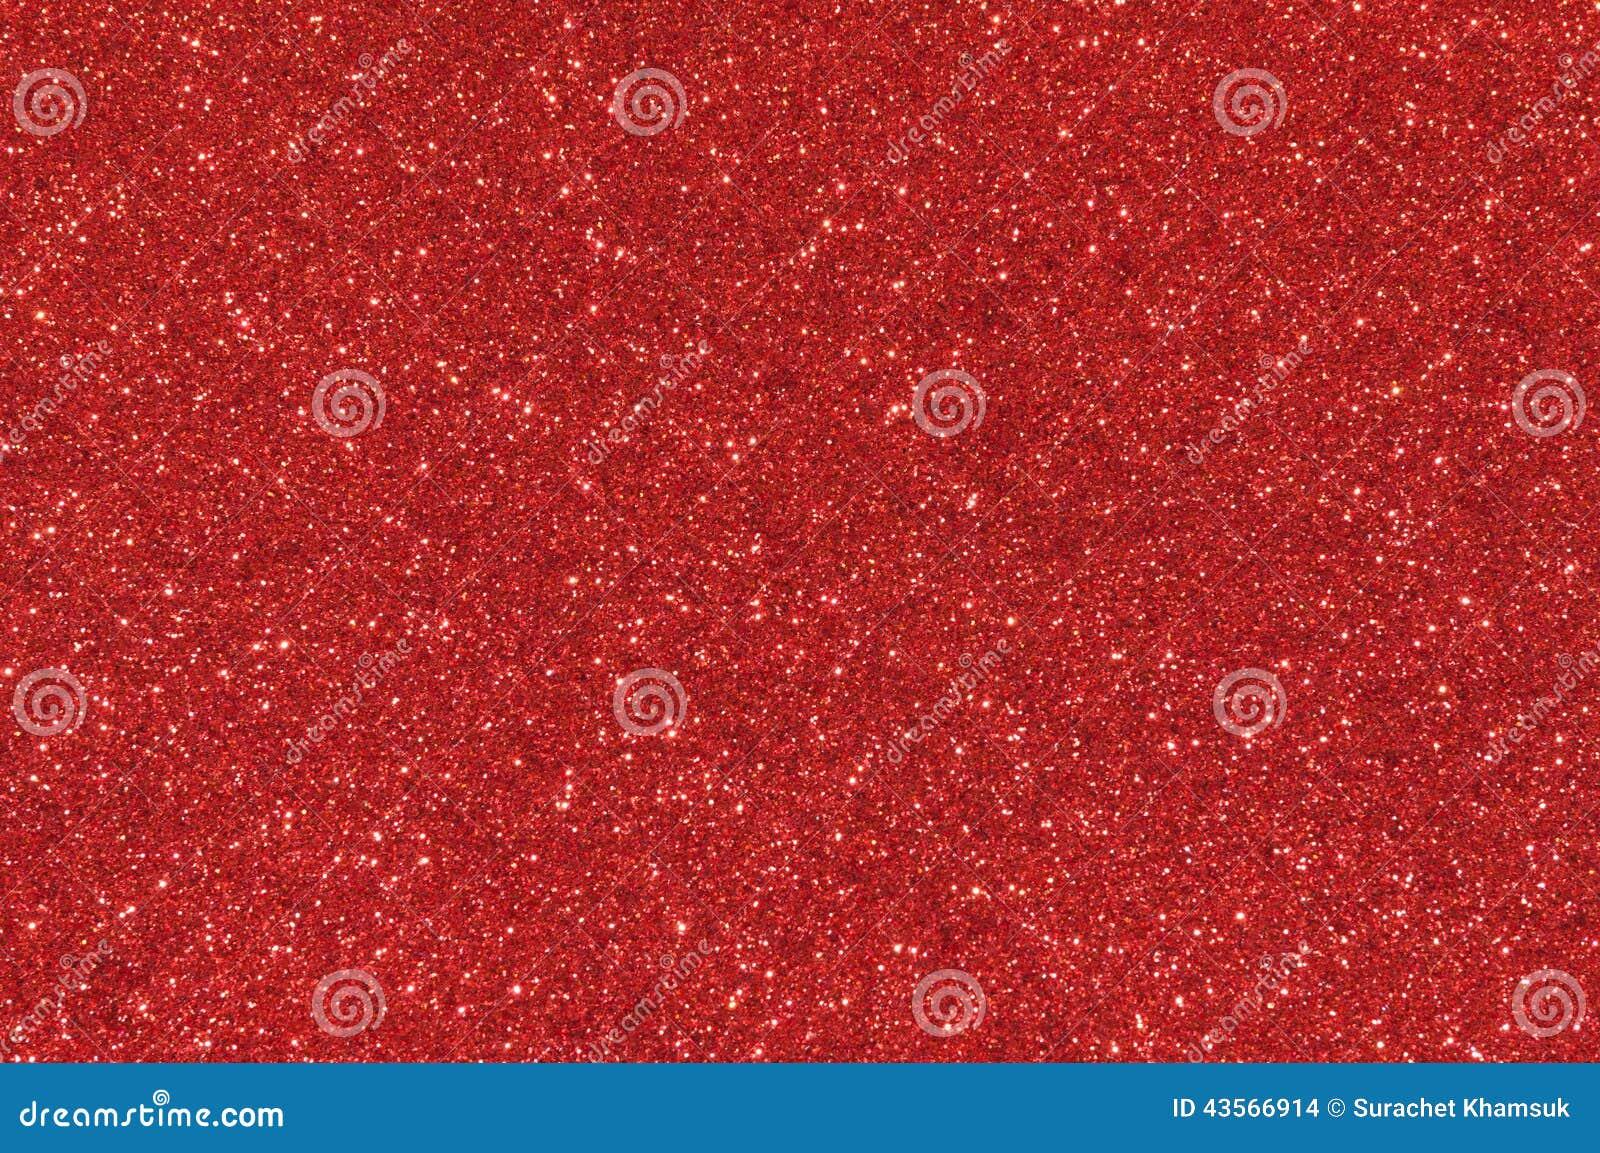 Red glitter texture va...